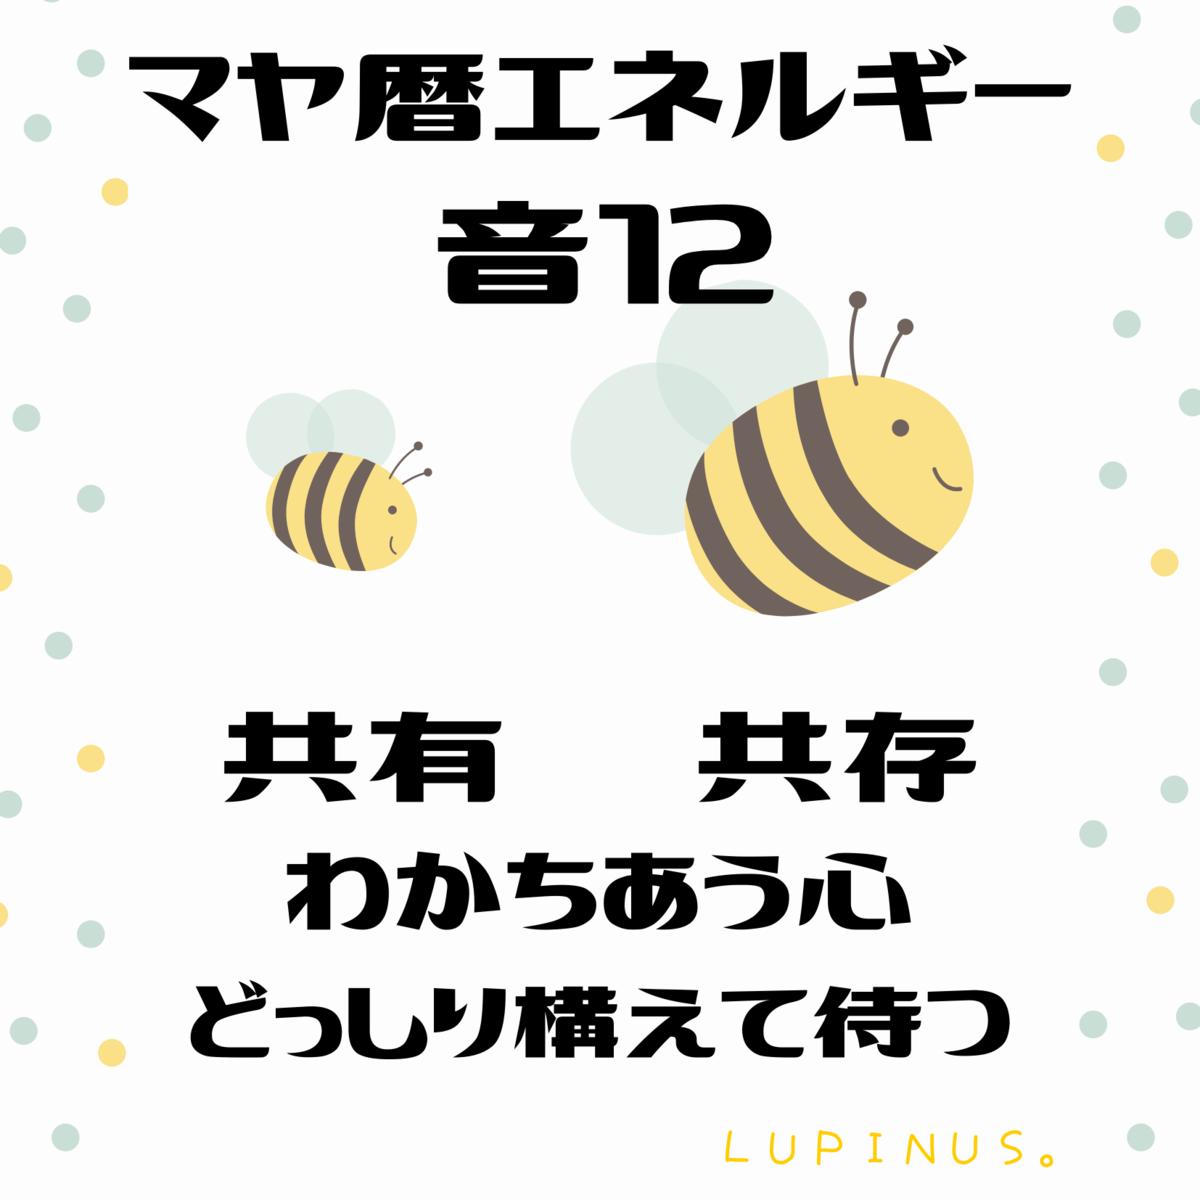 f:id:Lupinus104:20210121012315p:plain